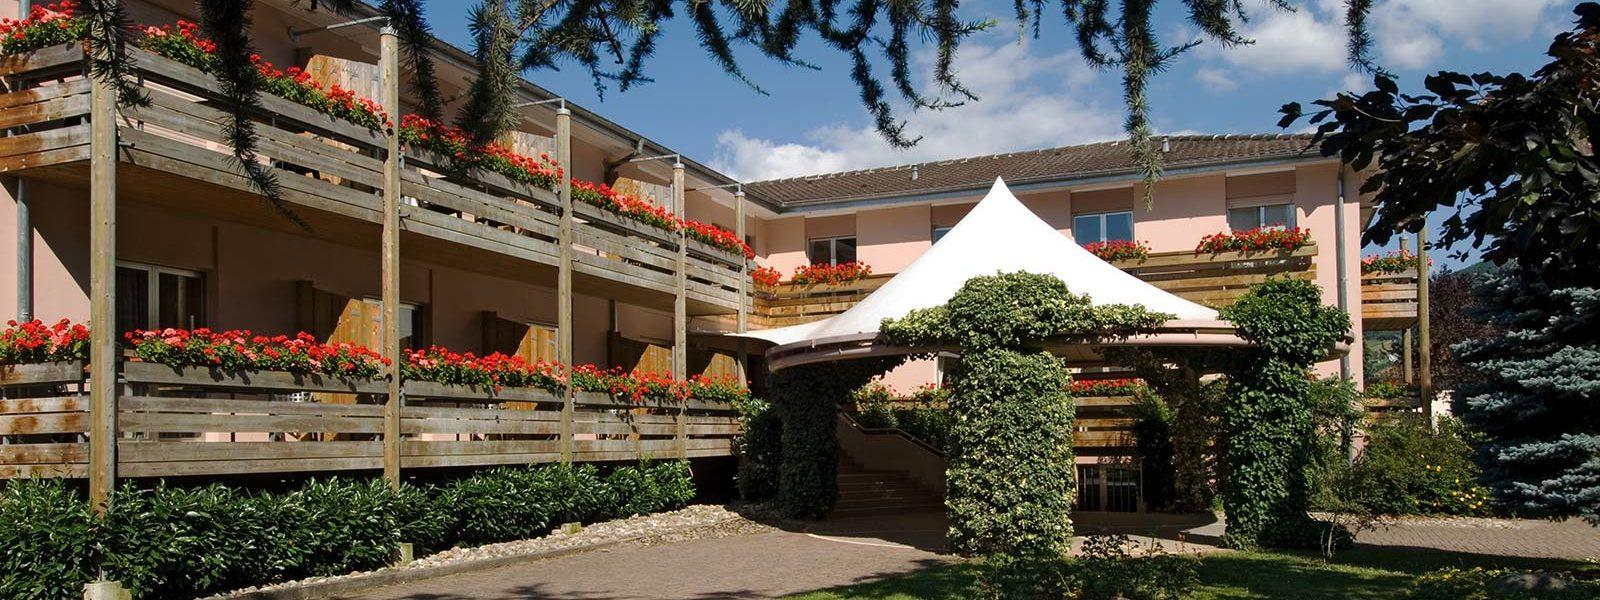 Hôtel Les Remparts 4 rue de la Flieh 68240 Kaysersberg